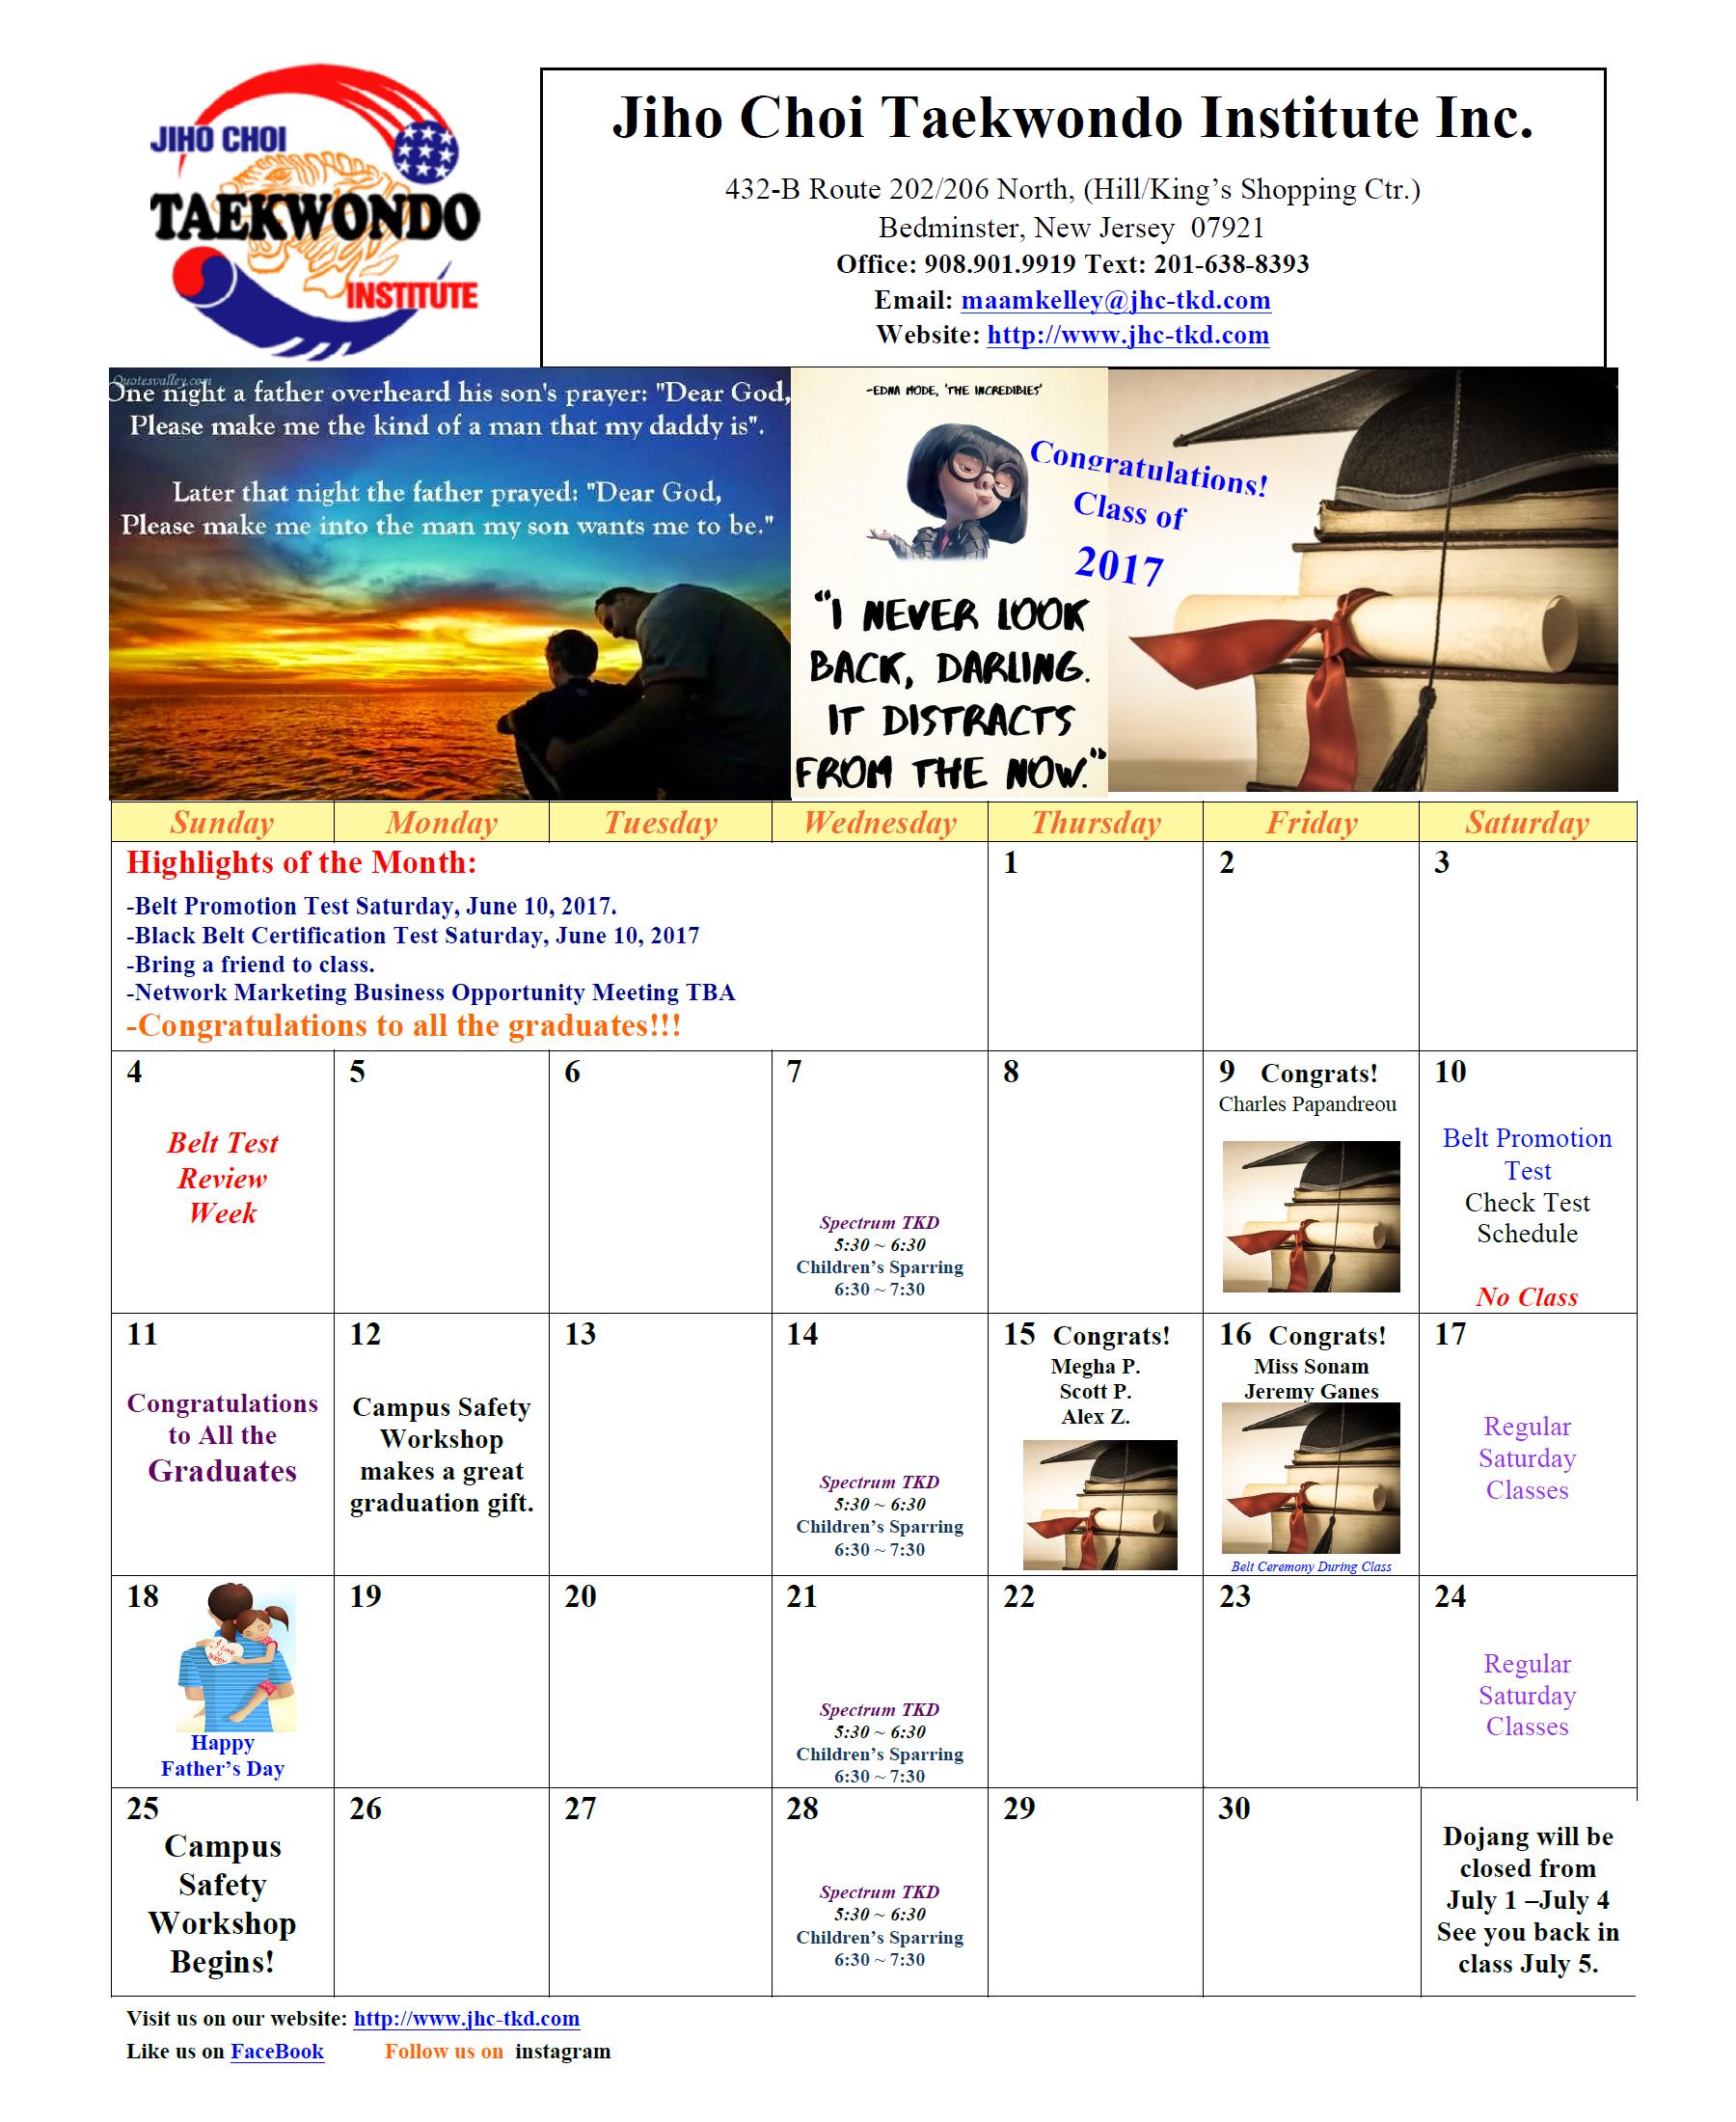 jhc-tkd-calendar-2017-06-june-fl